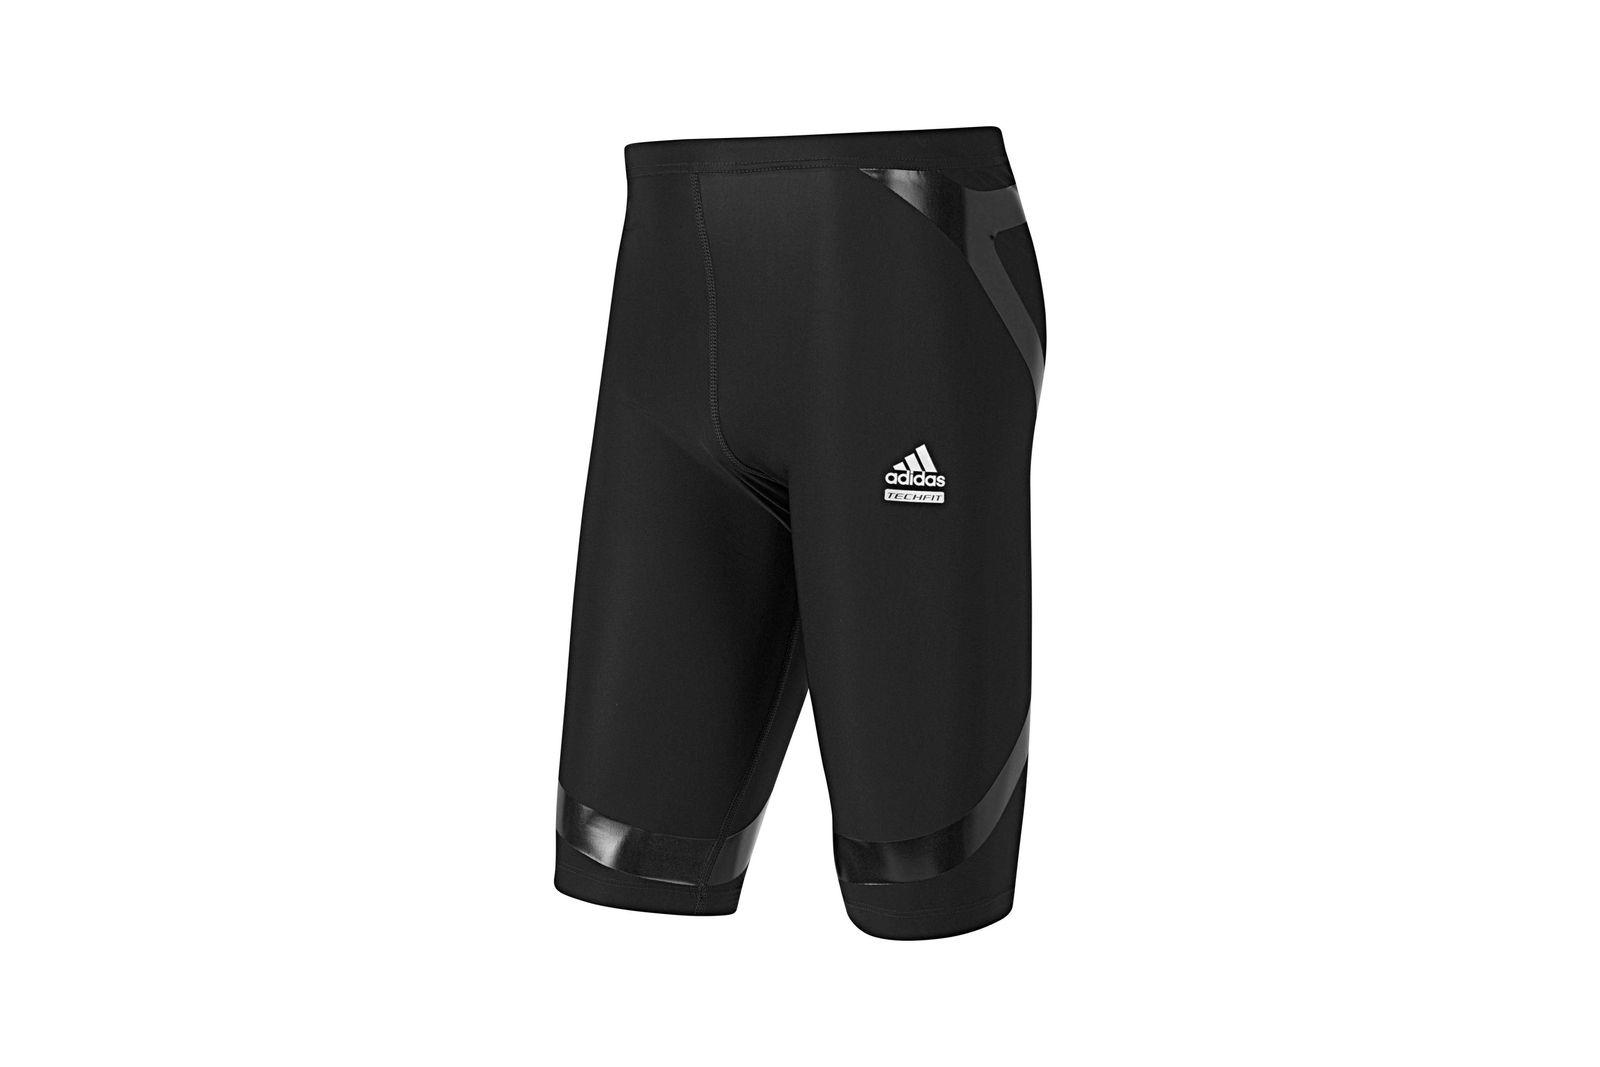 Adidas / Techfit Powerweb